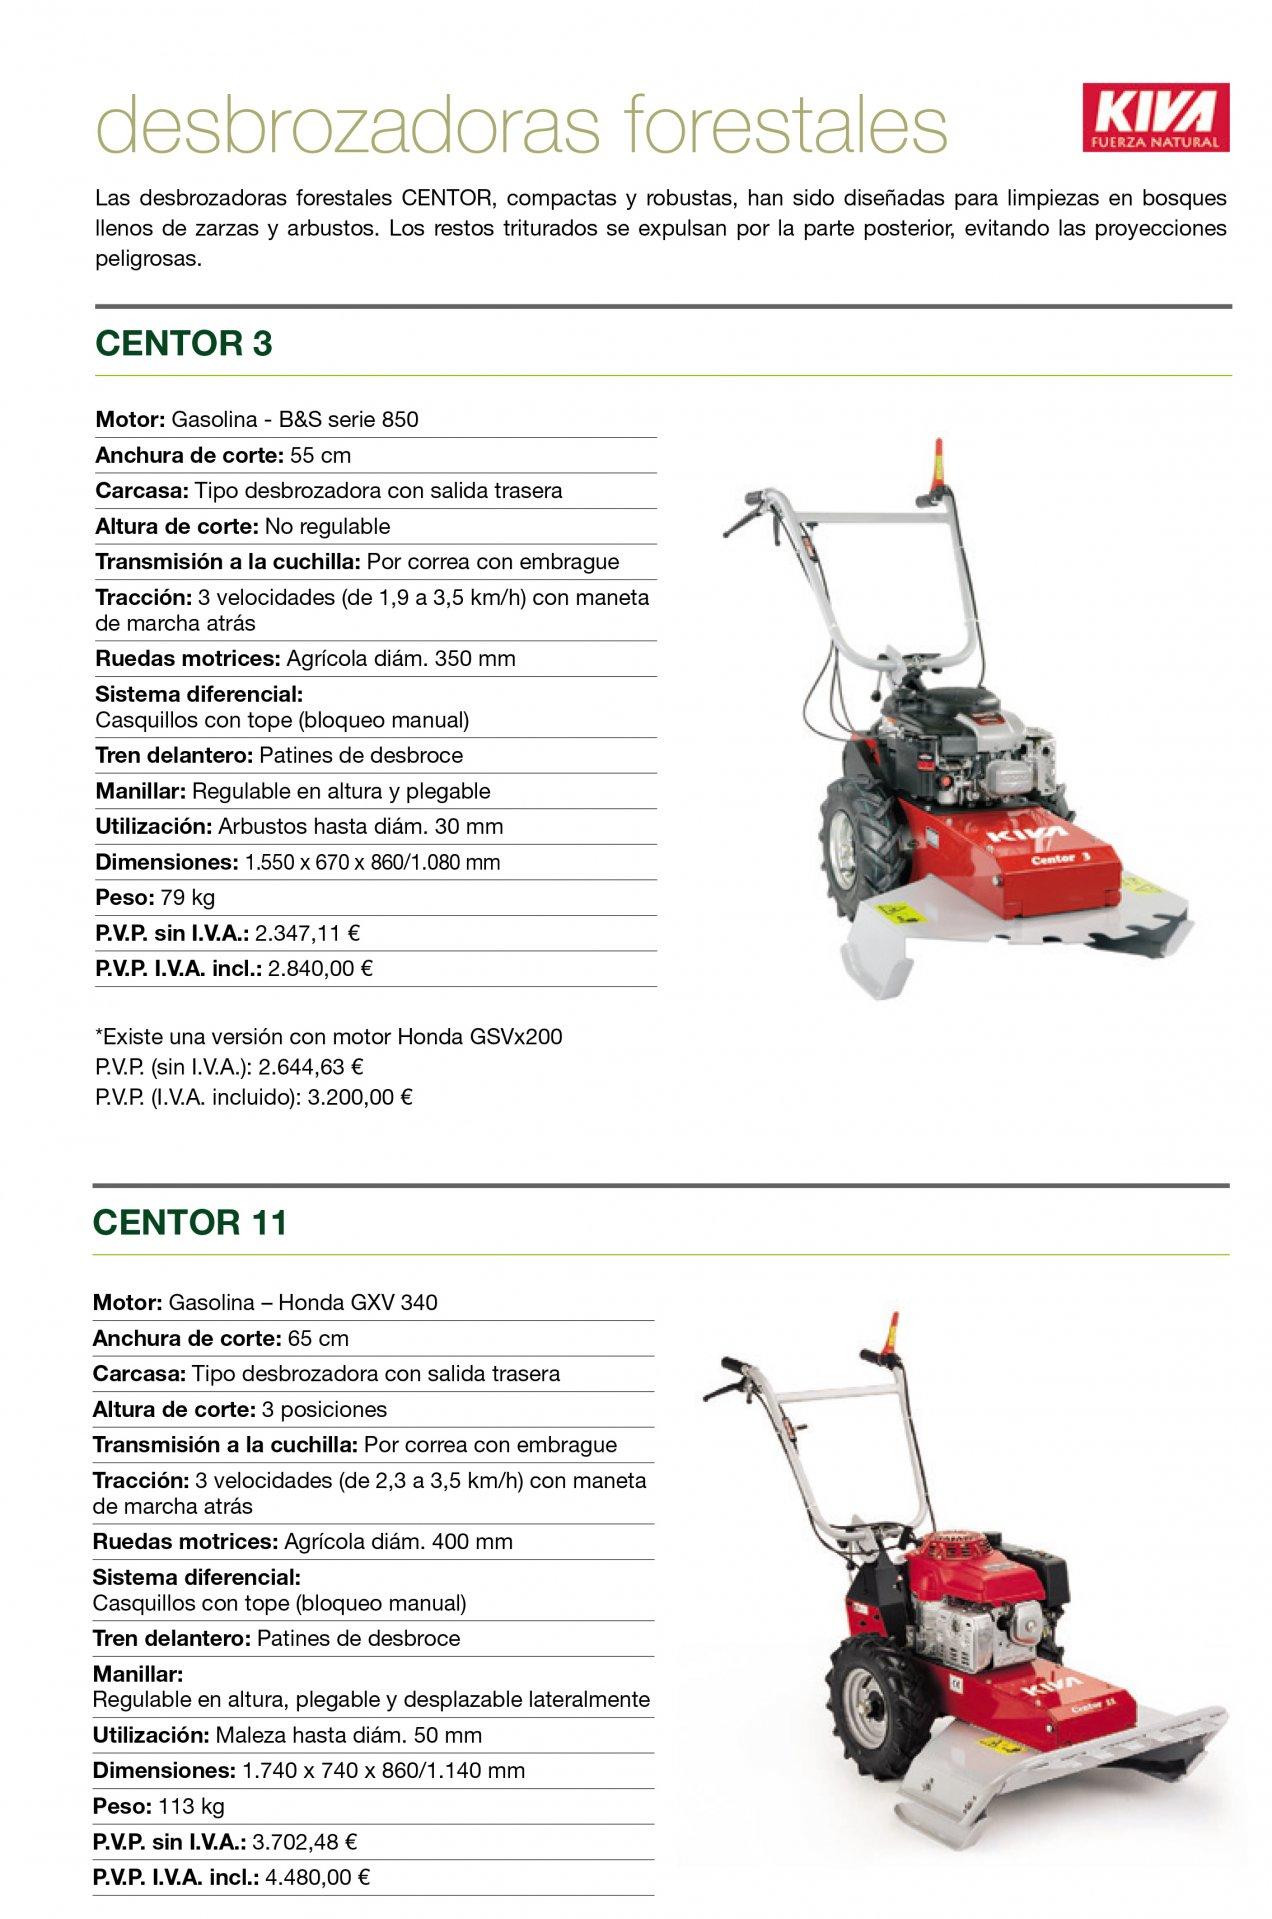 Desbrozadora de ruedas profesional KIVA Centor 3 / 11